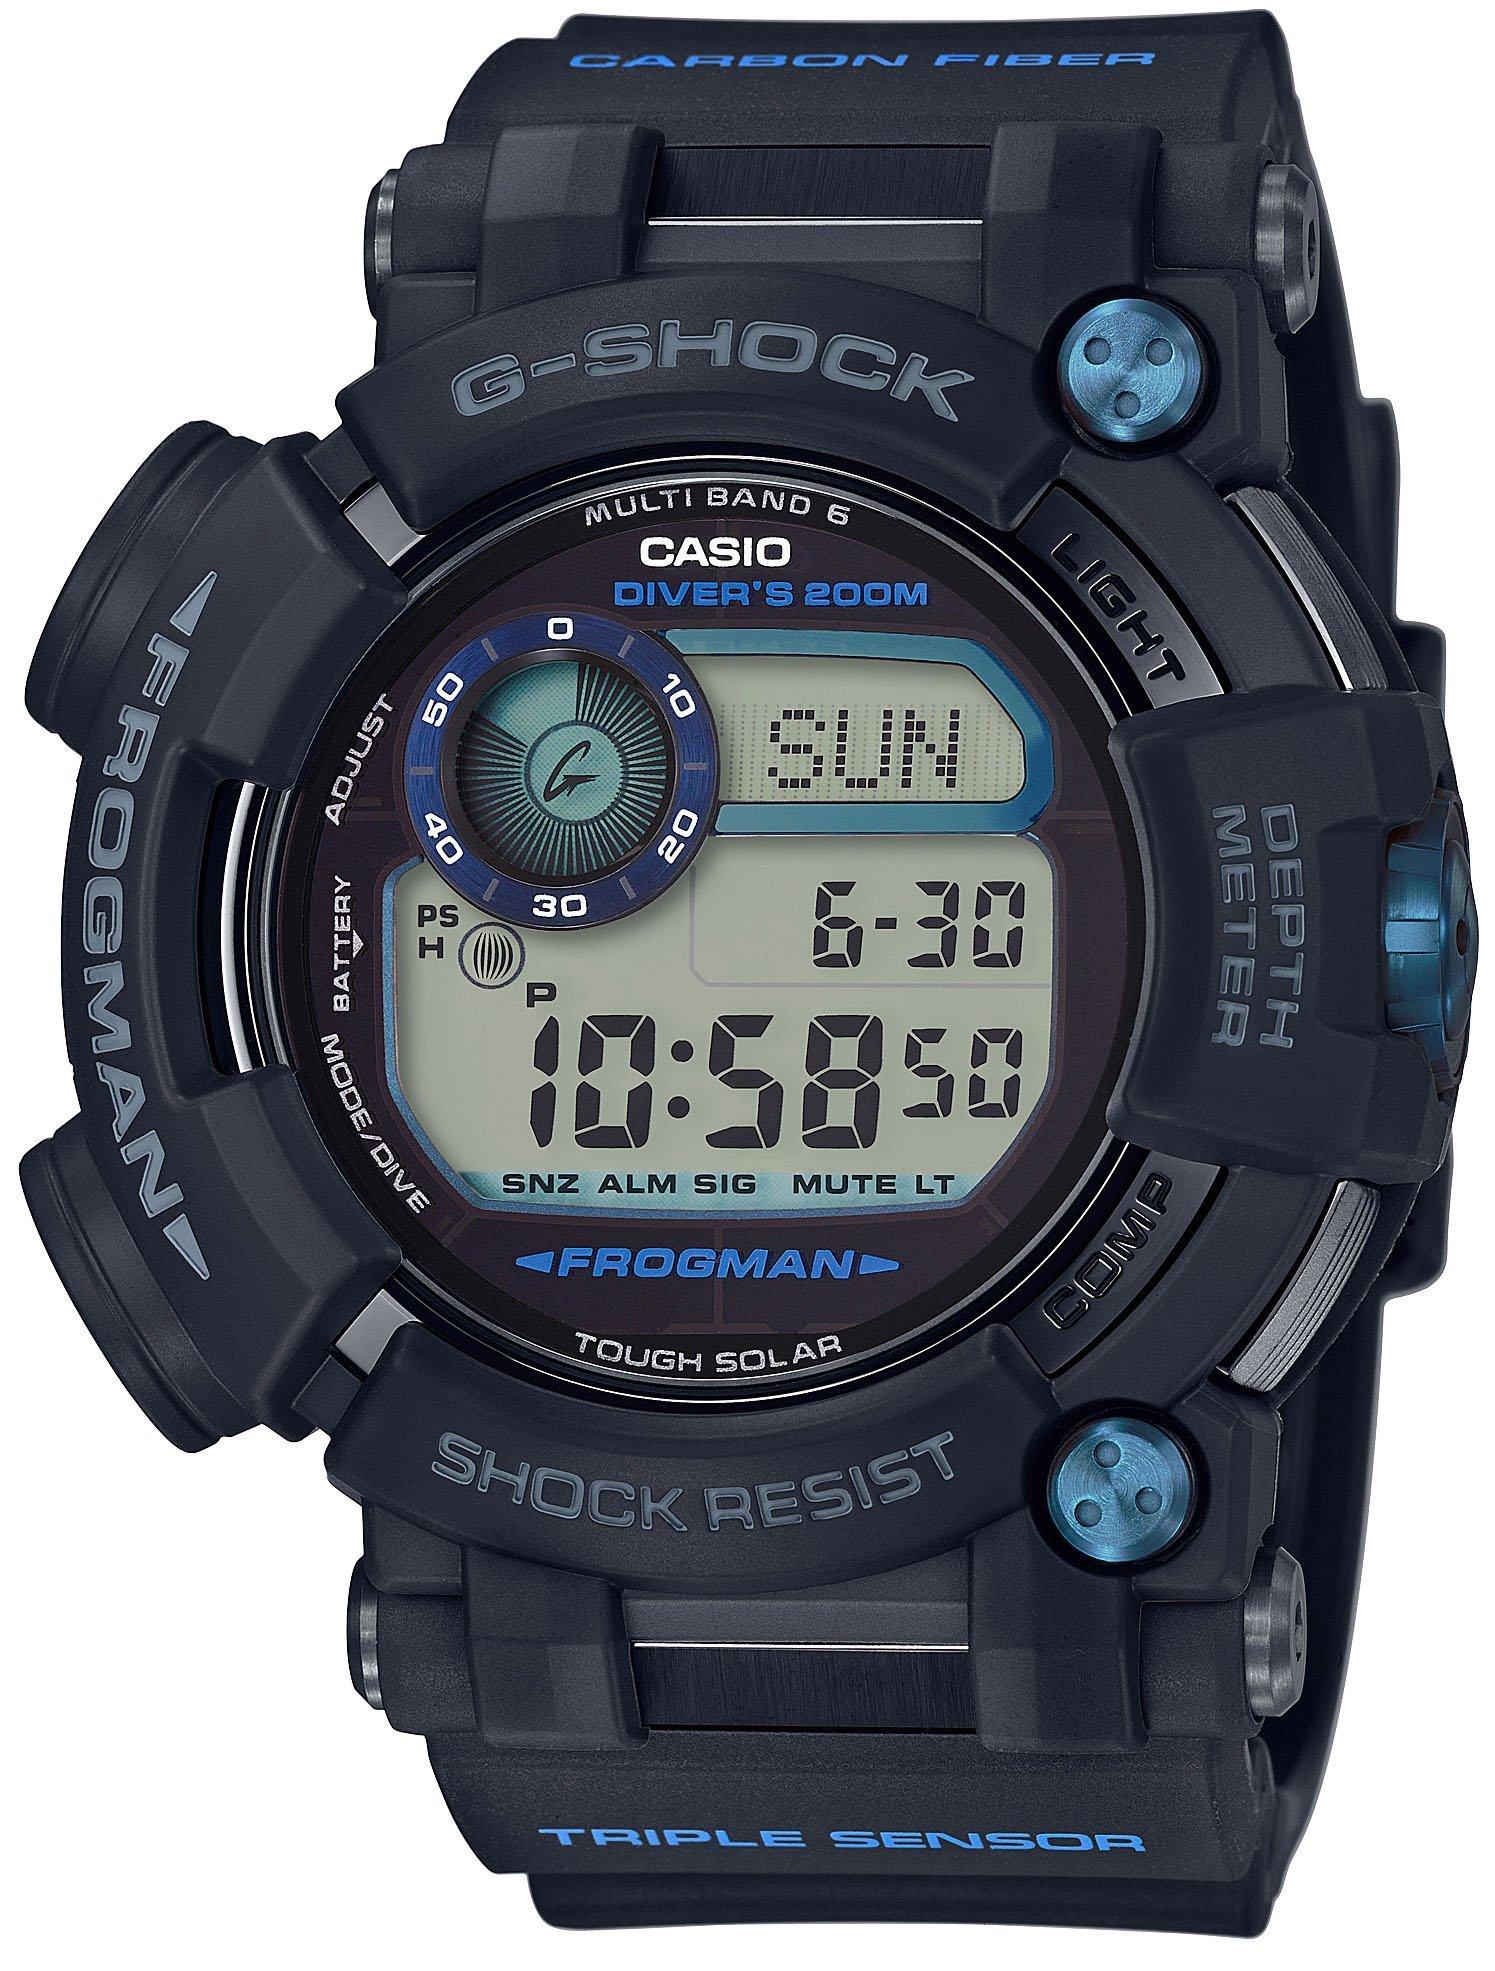 G-SHOCK マスター オブ G フロッグマン GWF-D1000B-1JF